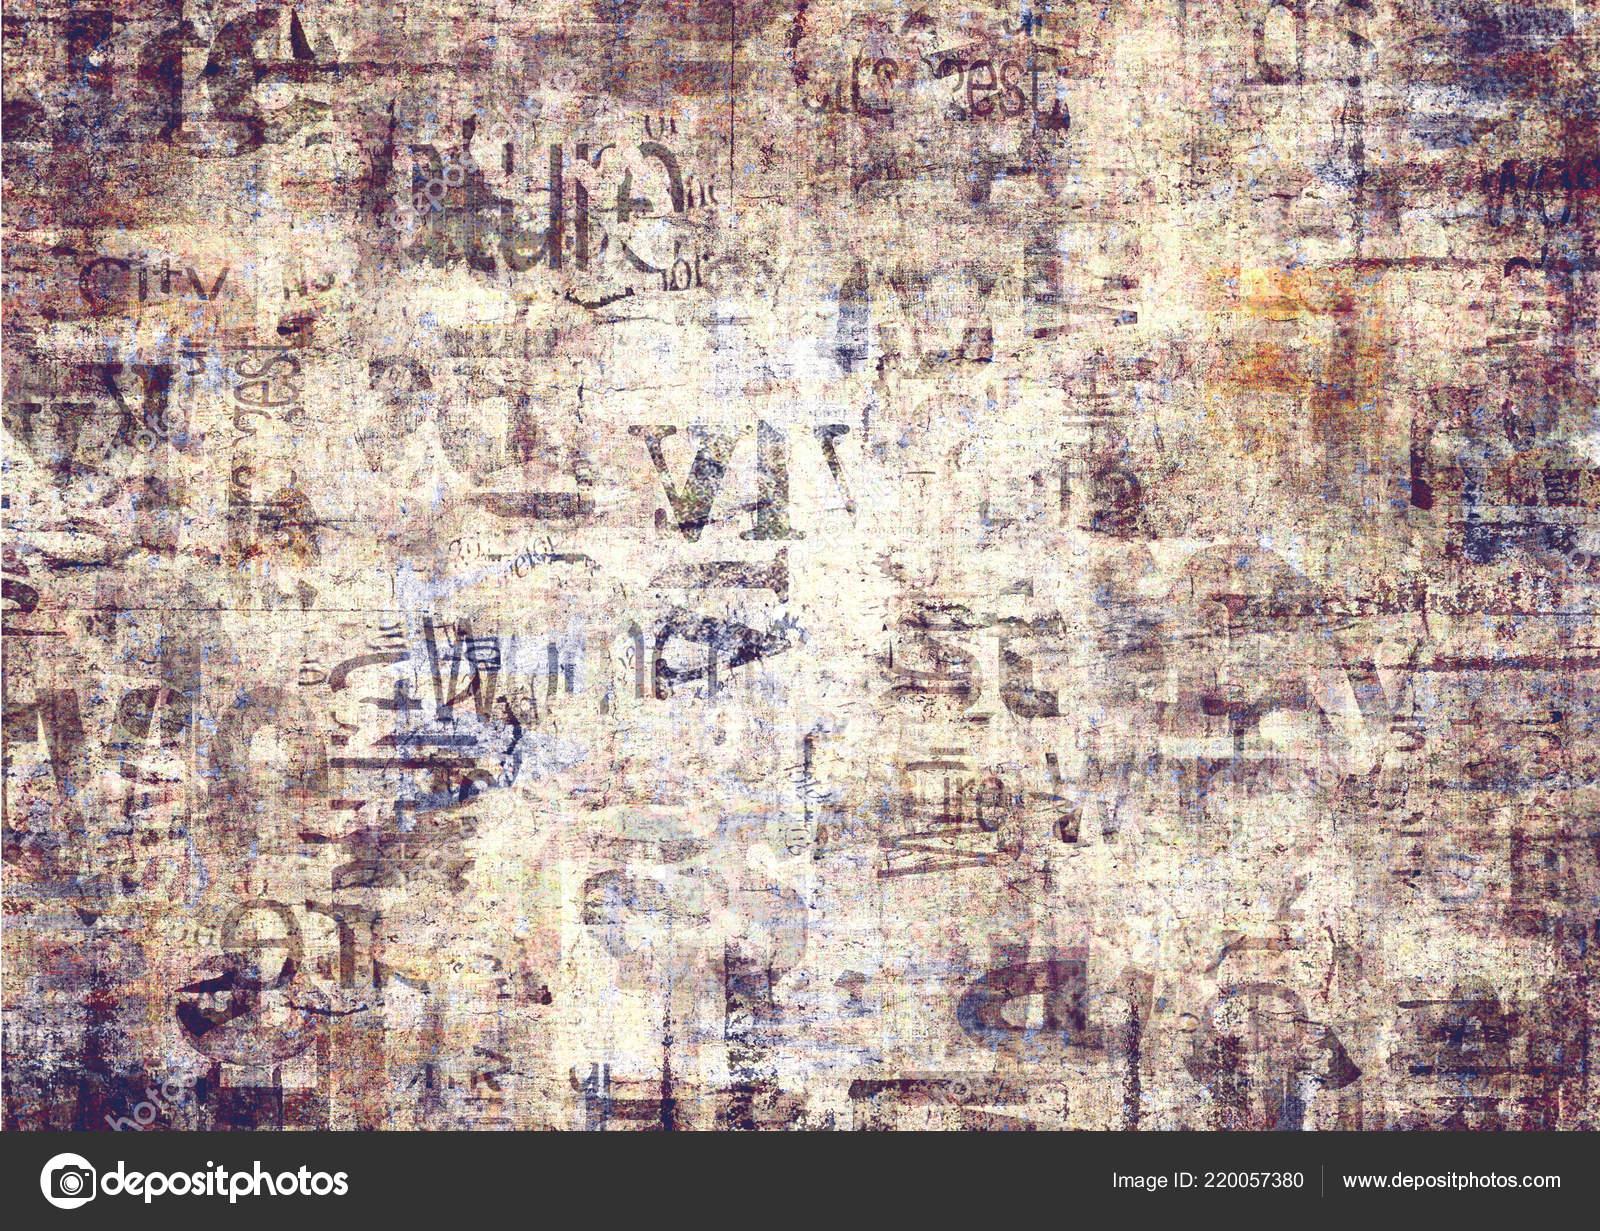 Papel Periódico Viejo Grunge Textura Fondo Horizontal